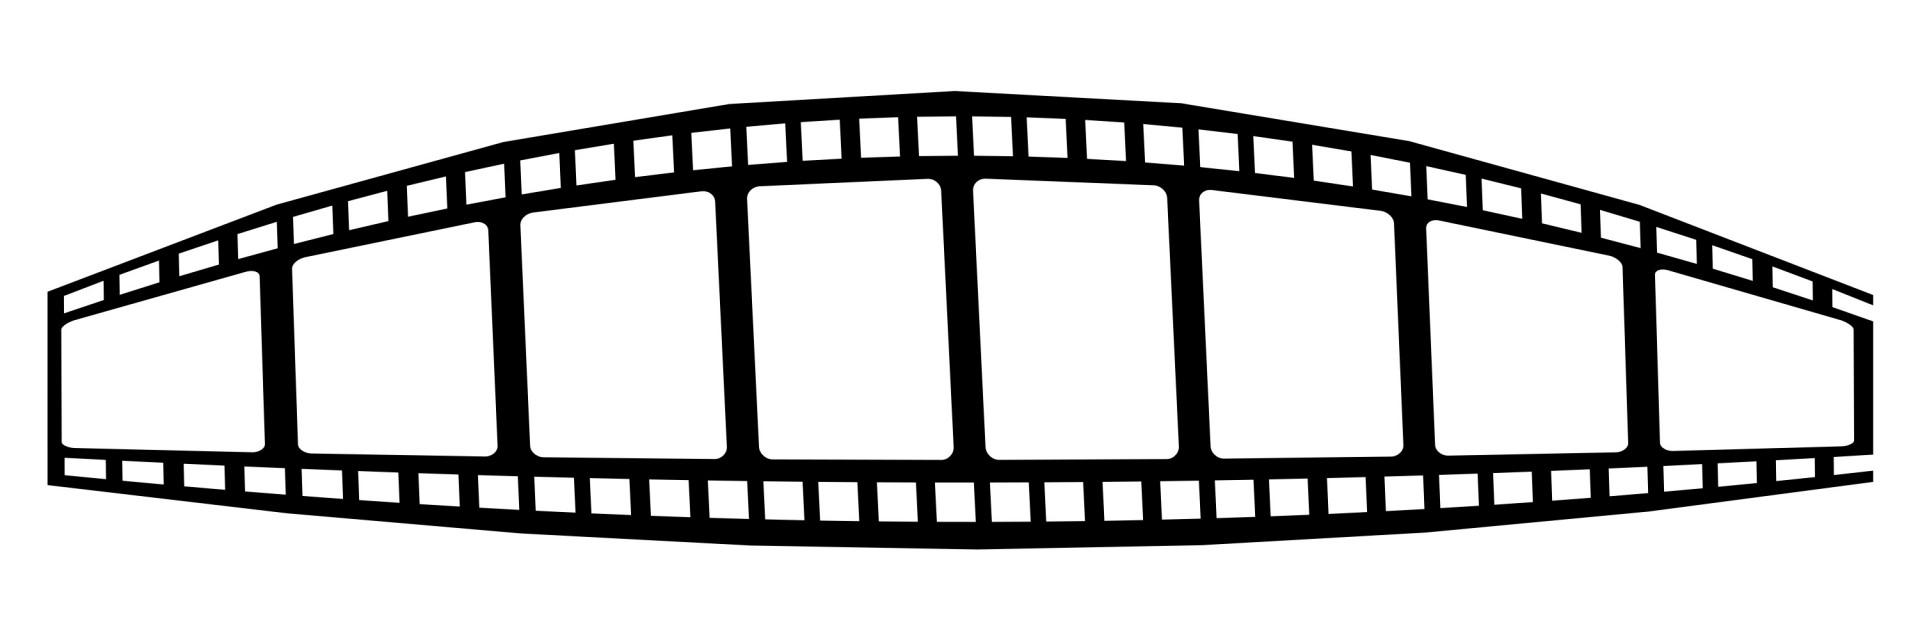 1920x640 Film Strip